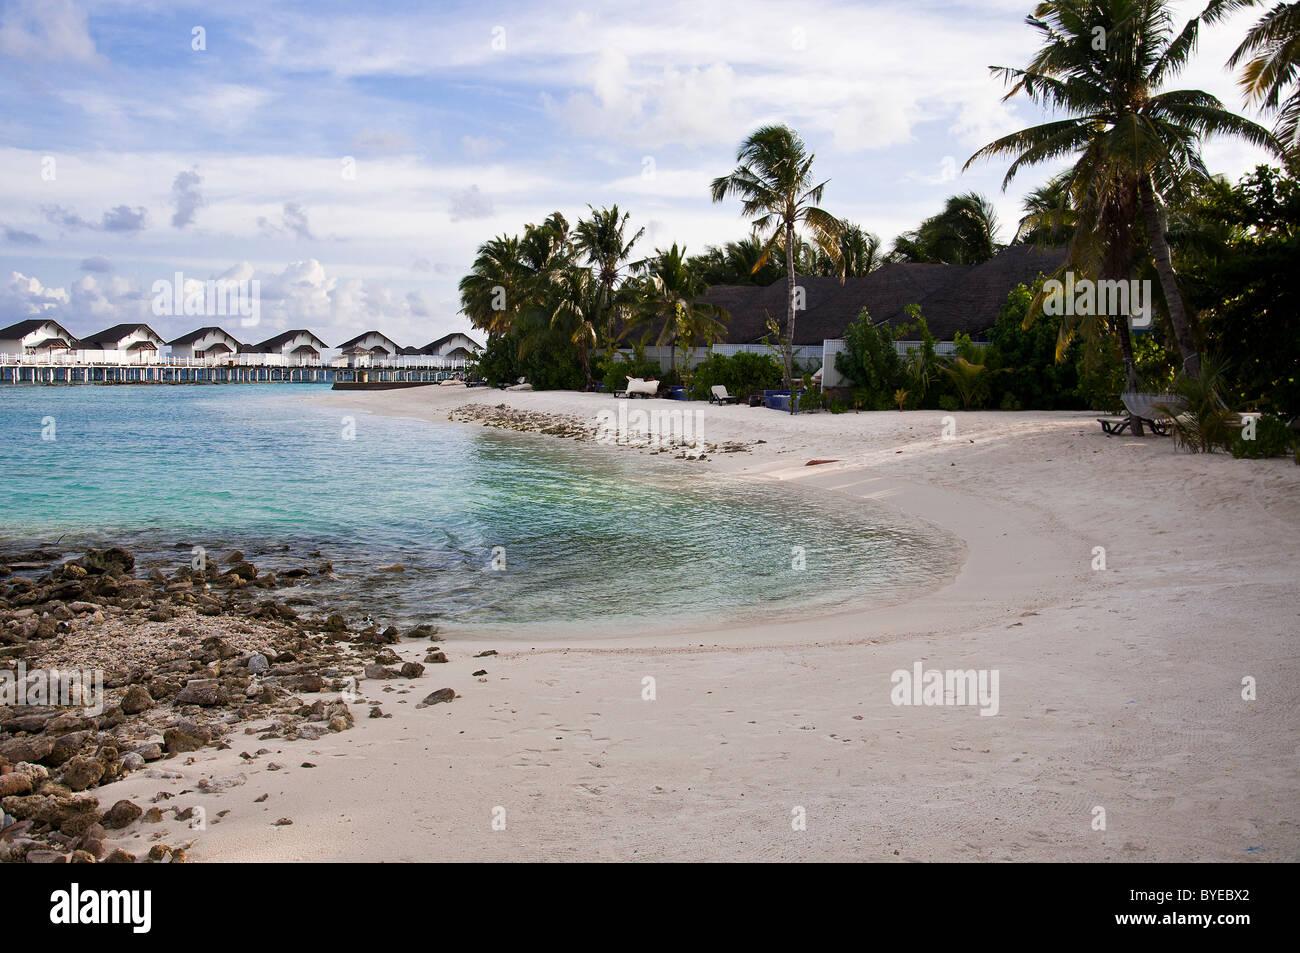 grand centara island maldives white sands blue sky turquoise sea honeymoon - Stock Image